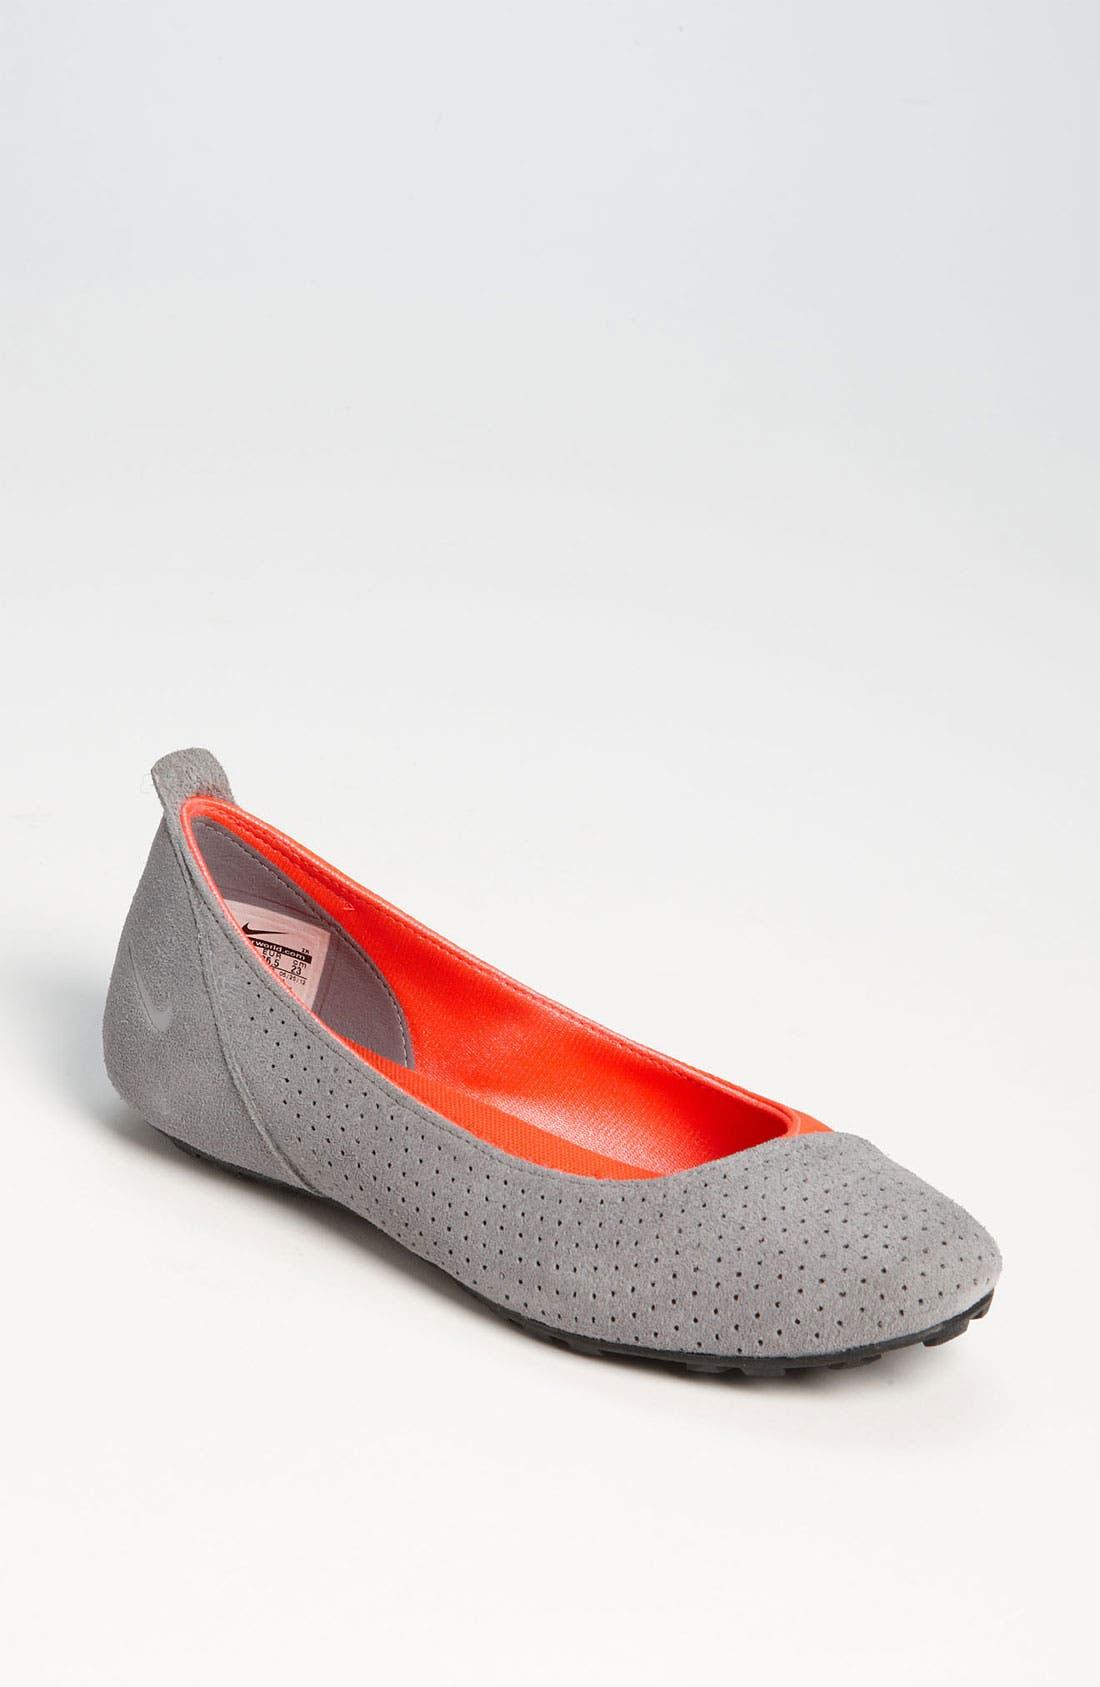 Main Image - Nike 'Amarina' Ballerina Flat